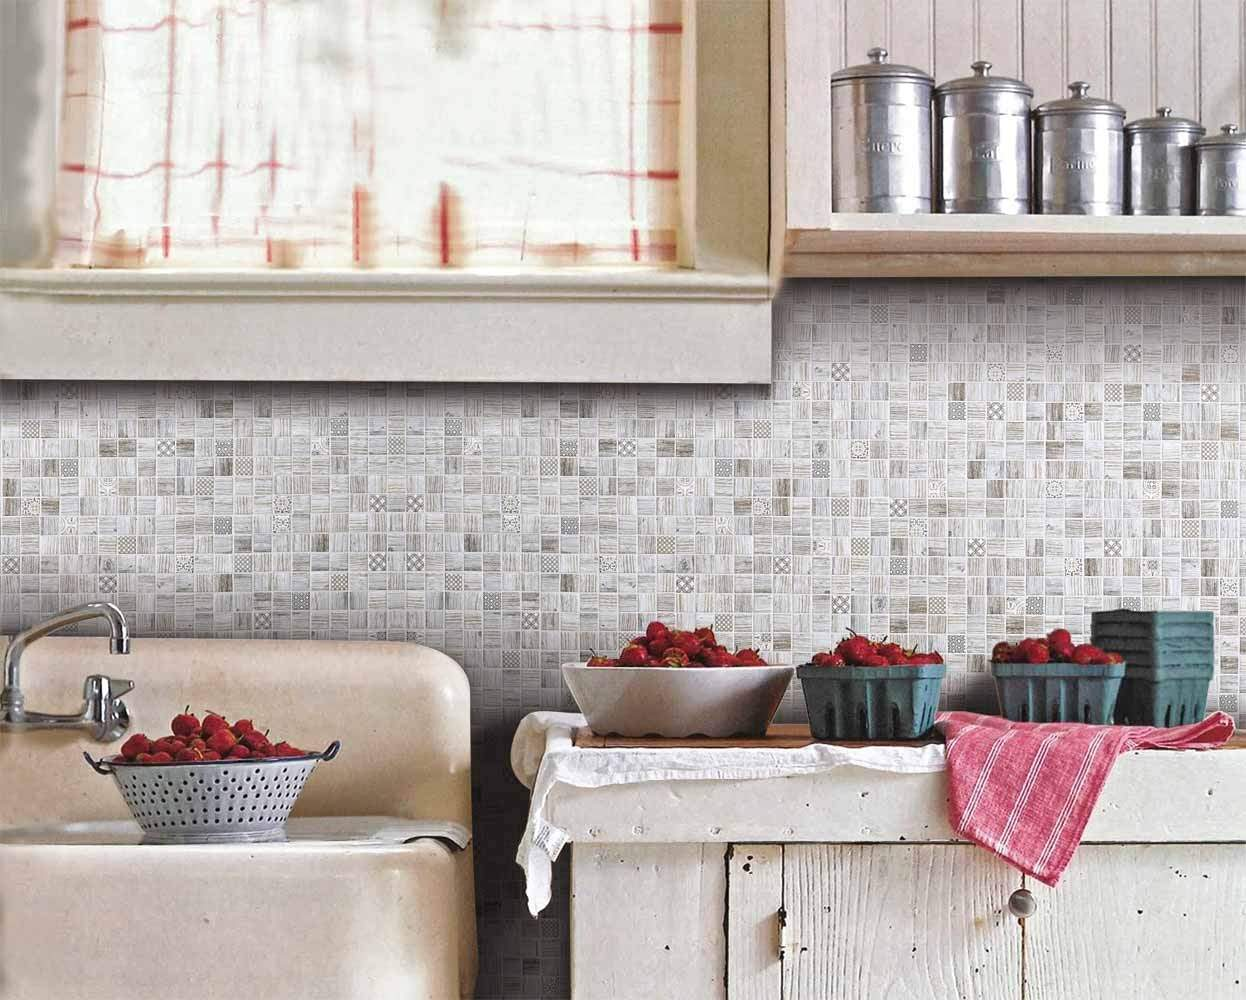 Buy Wooden Mosaic Tiles in Ireland at Italian Tile and Stone Dublin